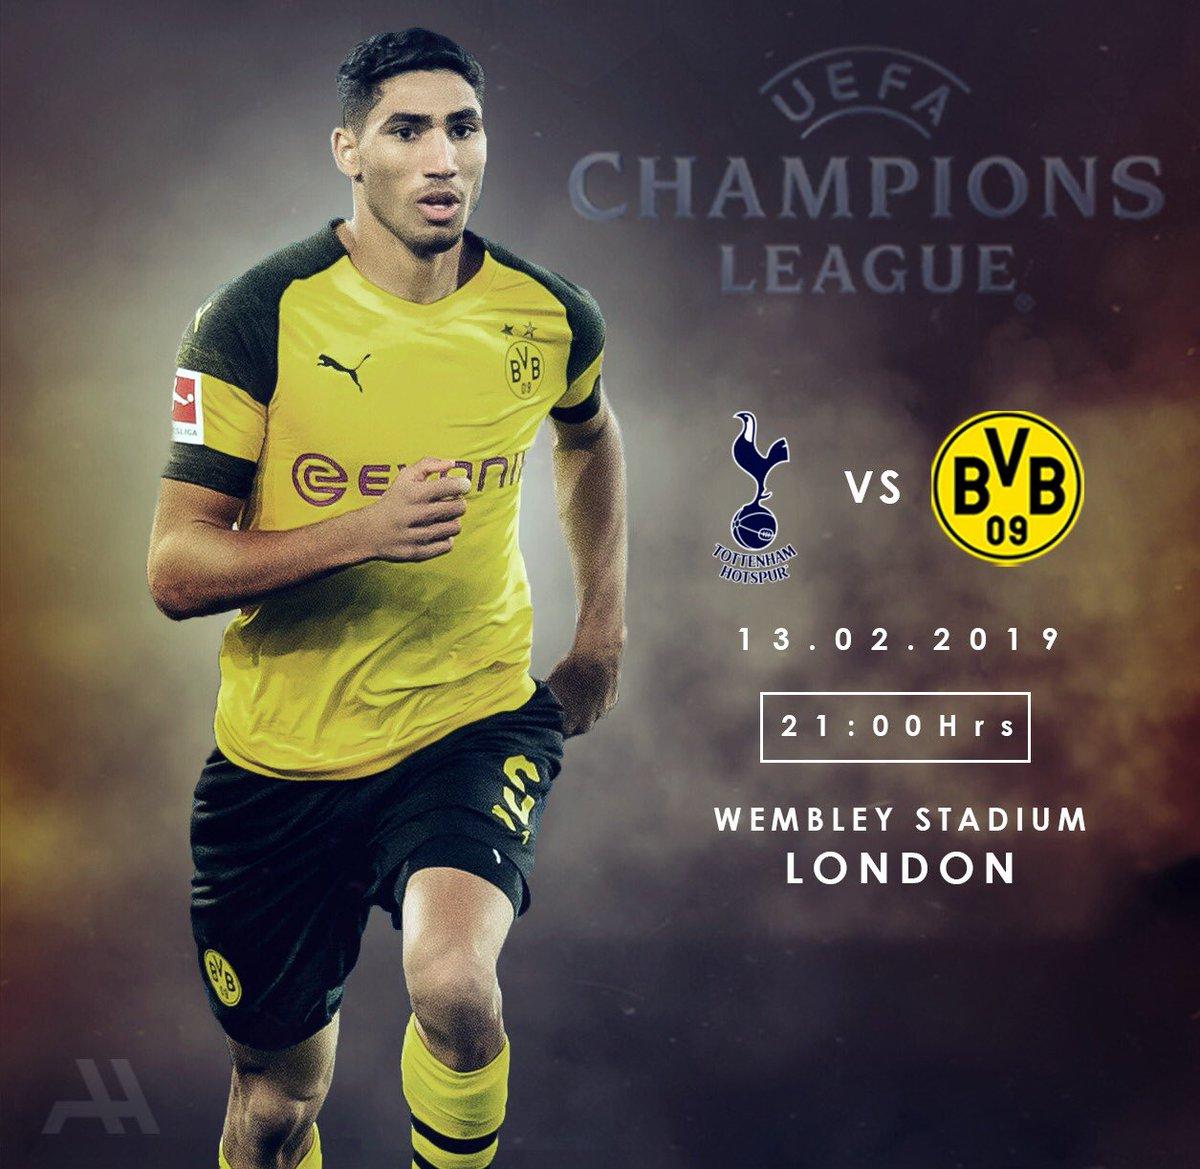 🏆 Champions League  🆚 Tottenham Hotspur 🏟  Wembley Stadium 🗓️ Wednesday, February 13th ⏰ 21:00 ⚽️🐝 #THFBVB